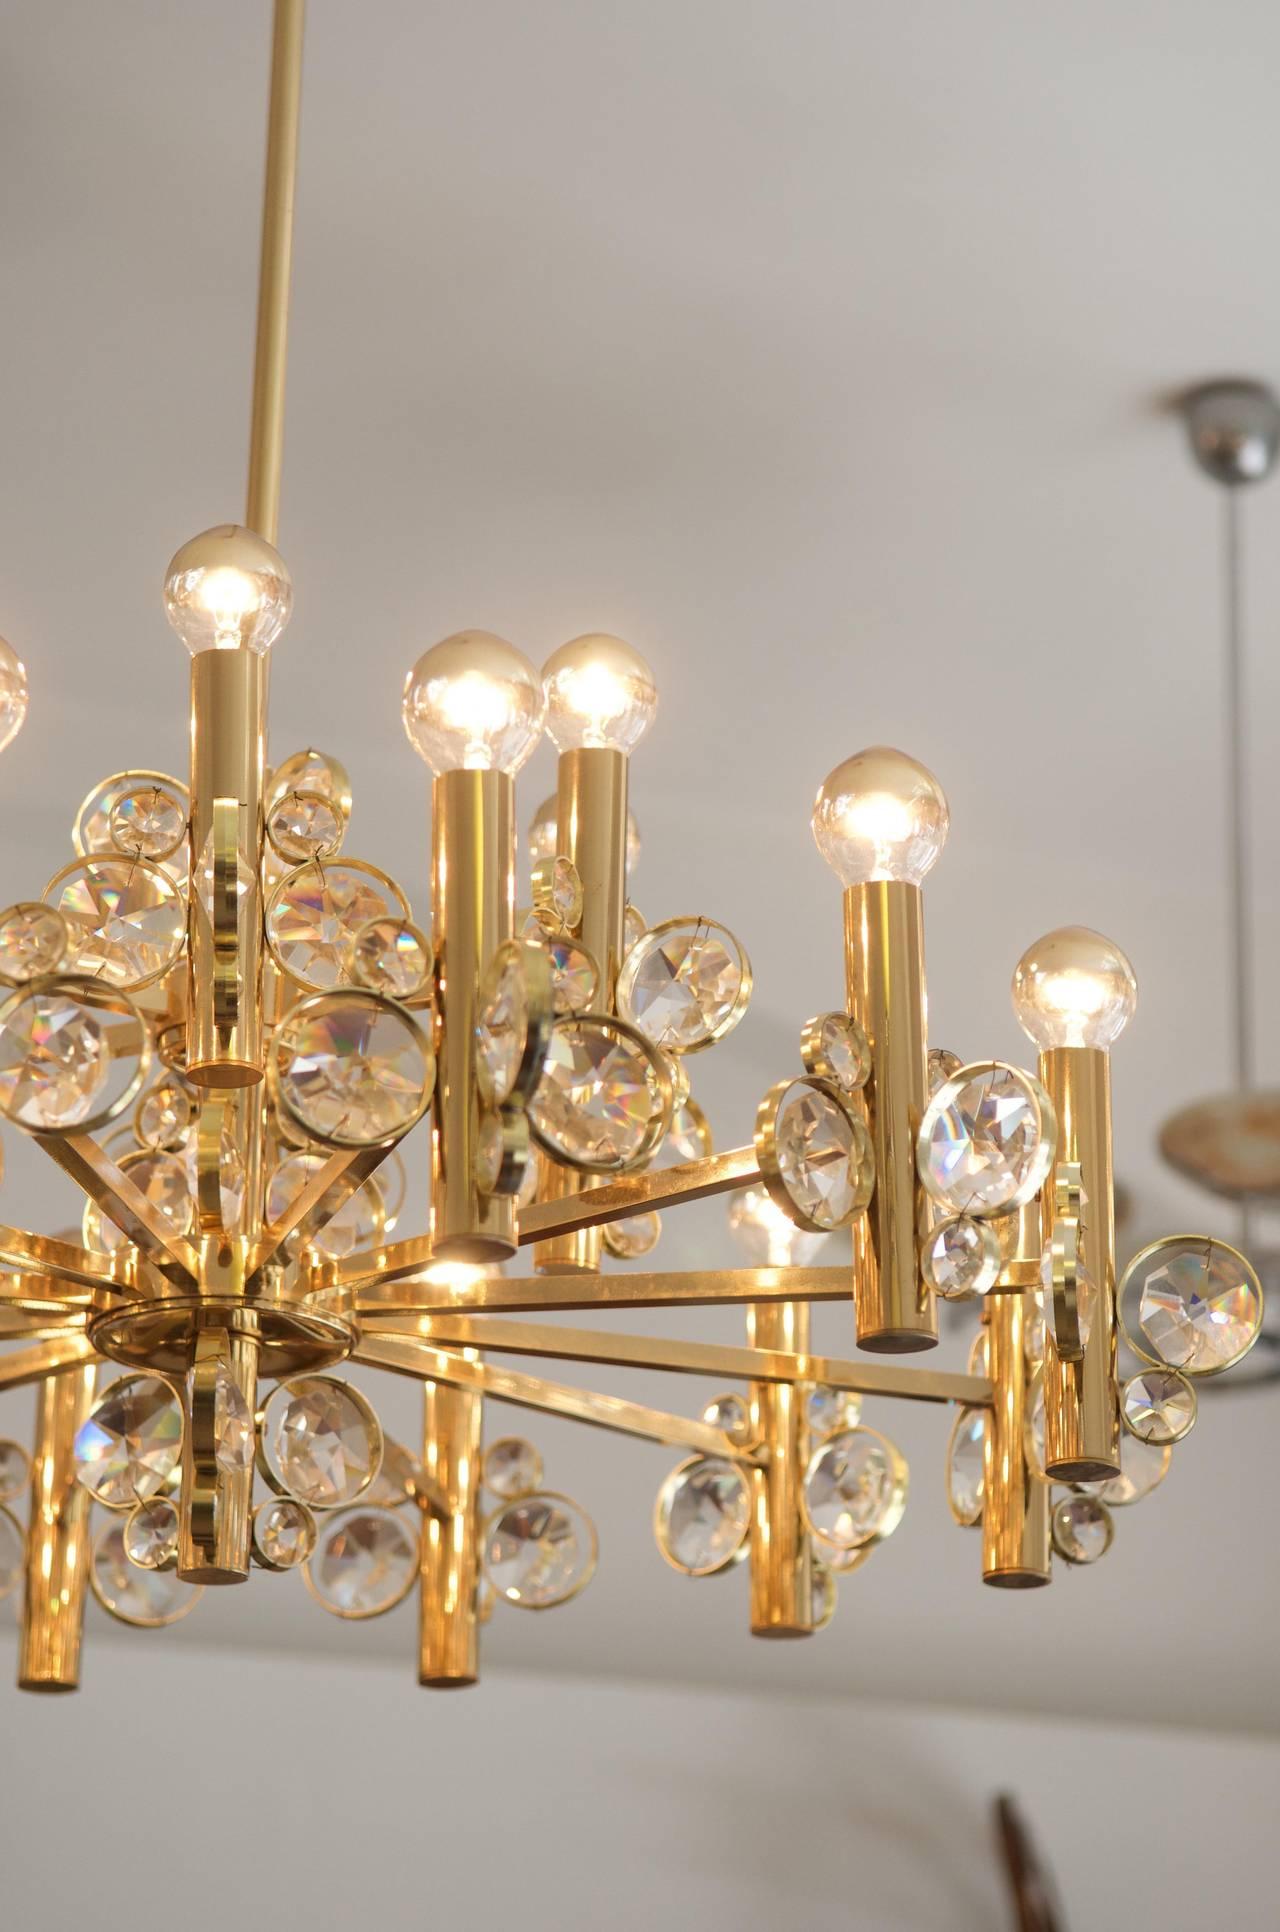 Brass Large Impressive Cut Crystal Chandelier Attributed to Gaetano Sciolari For Sale